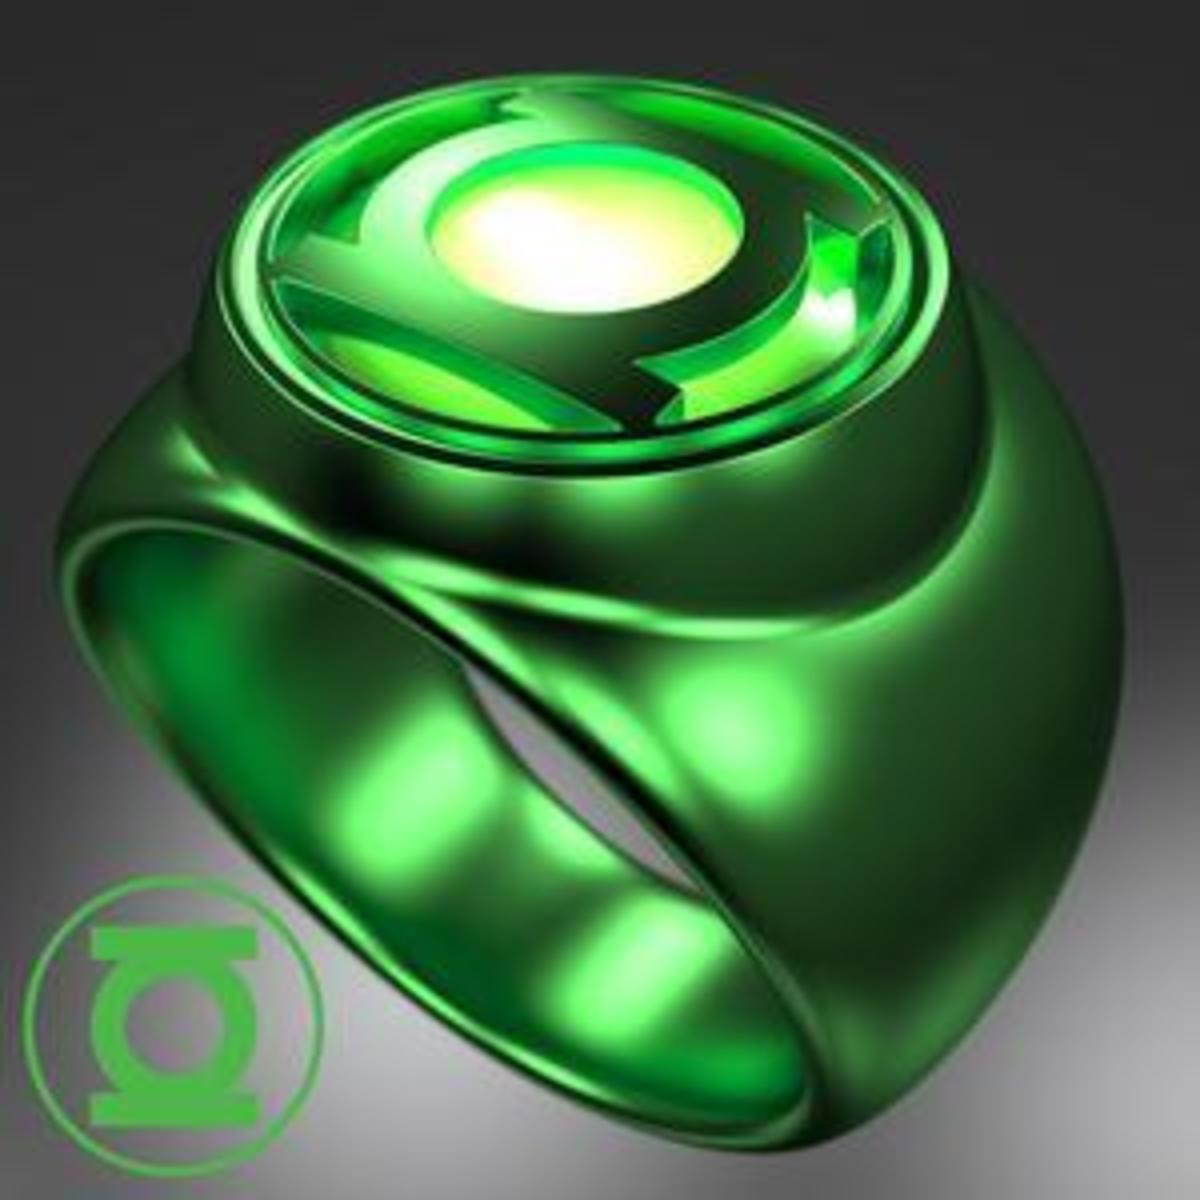 The Green Lantern Power Ring